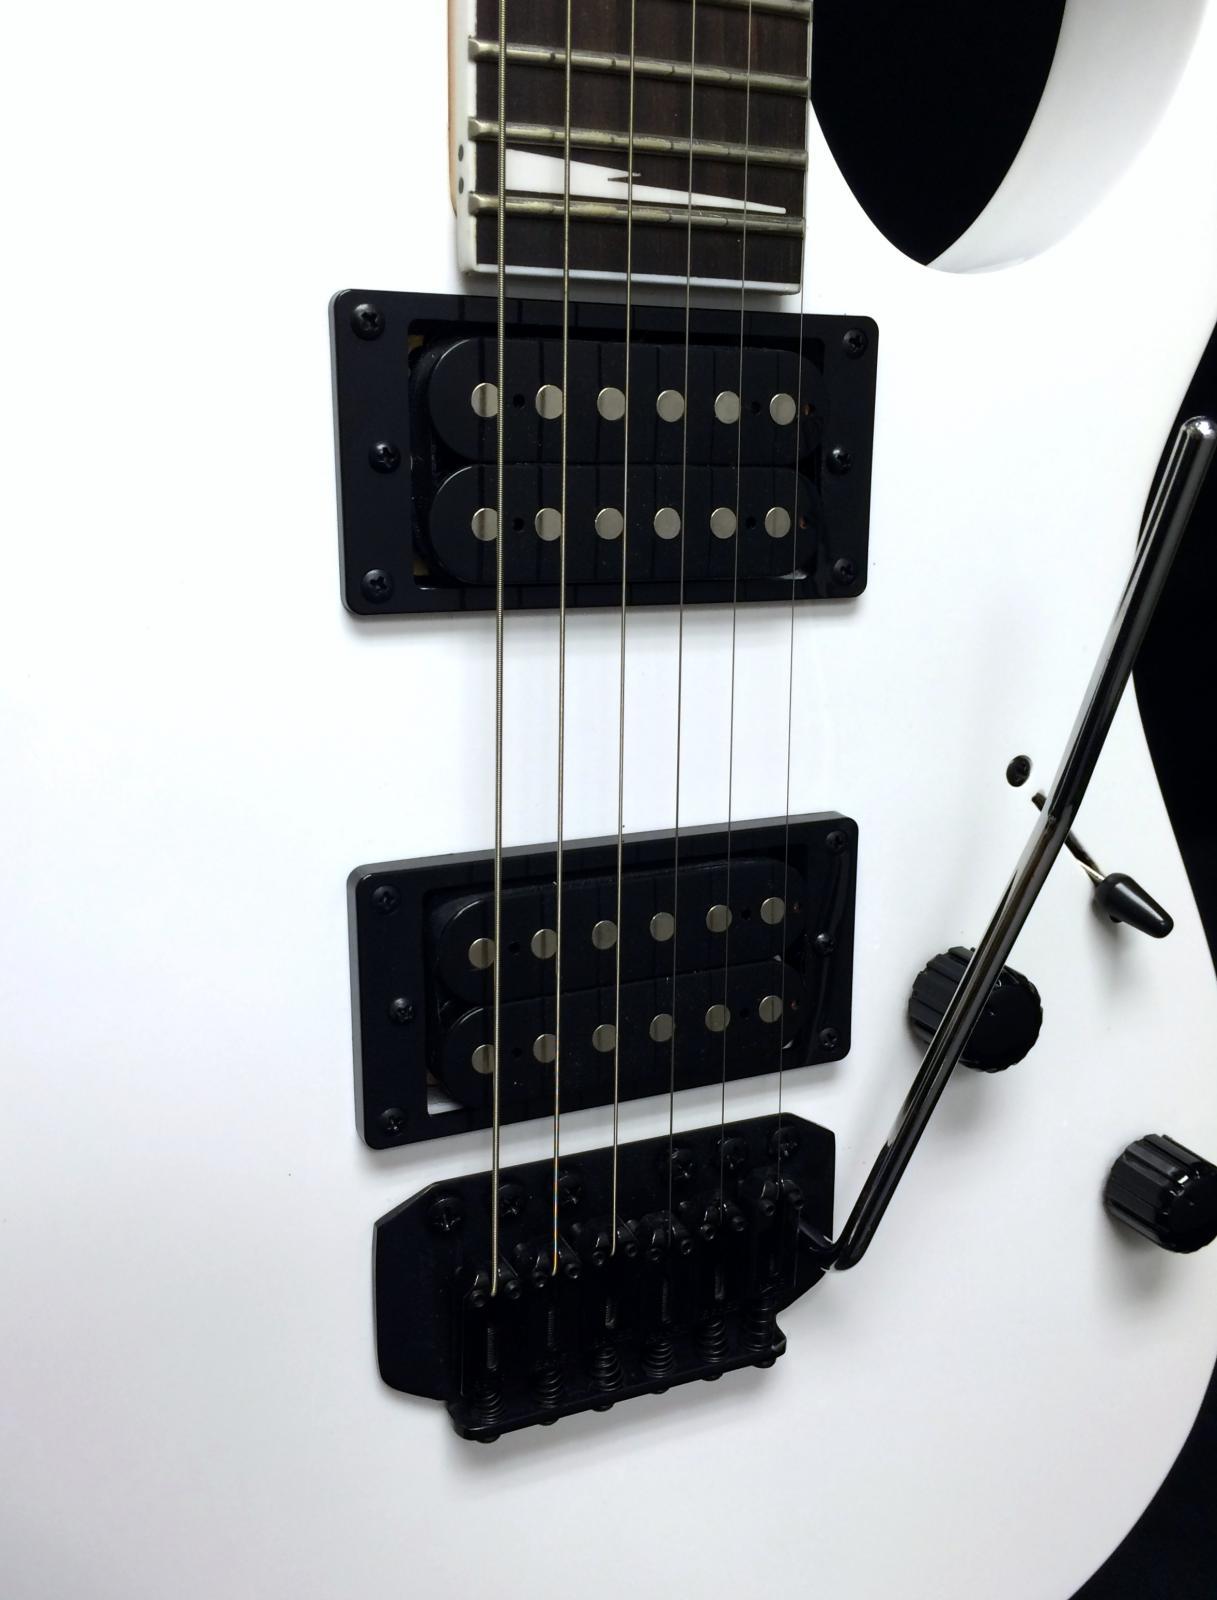 ibanez grg120bdx gio series electric guitar white. Black Bedroom Furniture Sets. Home Design Ideas